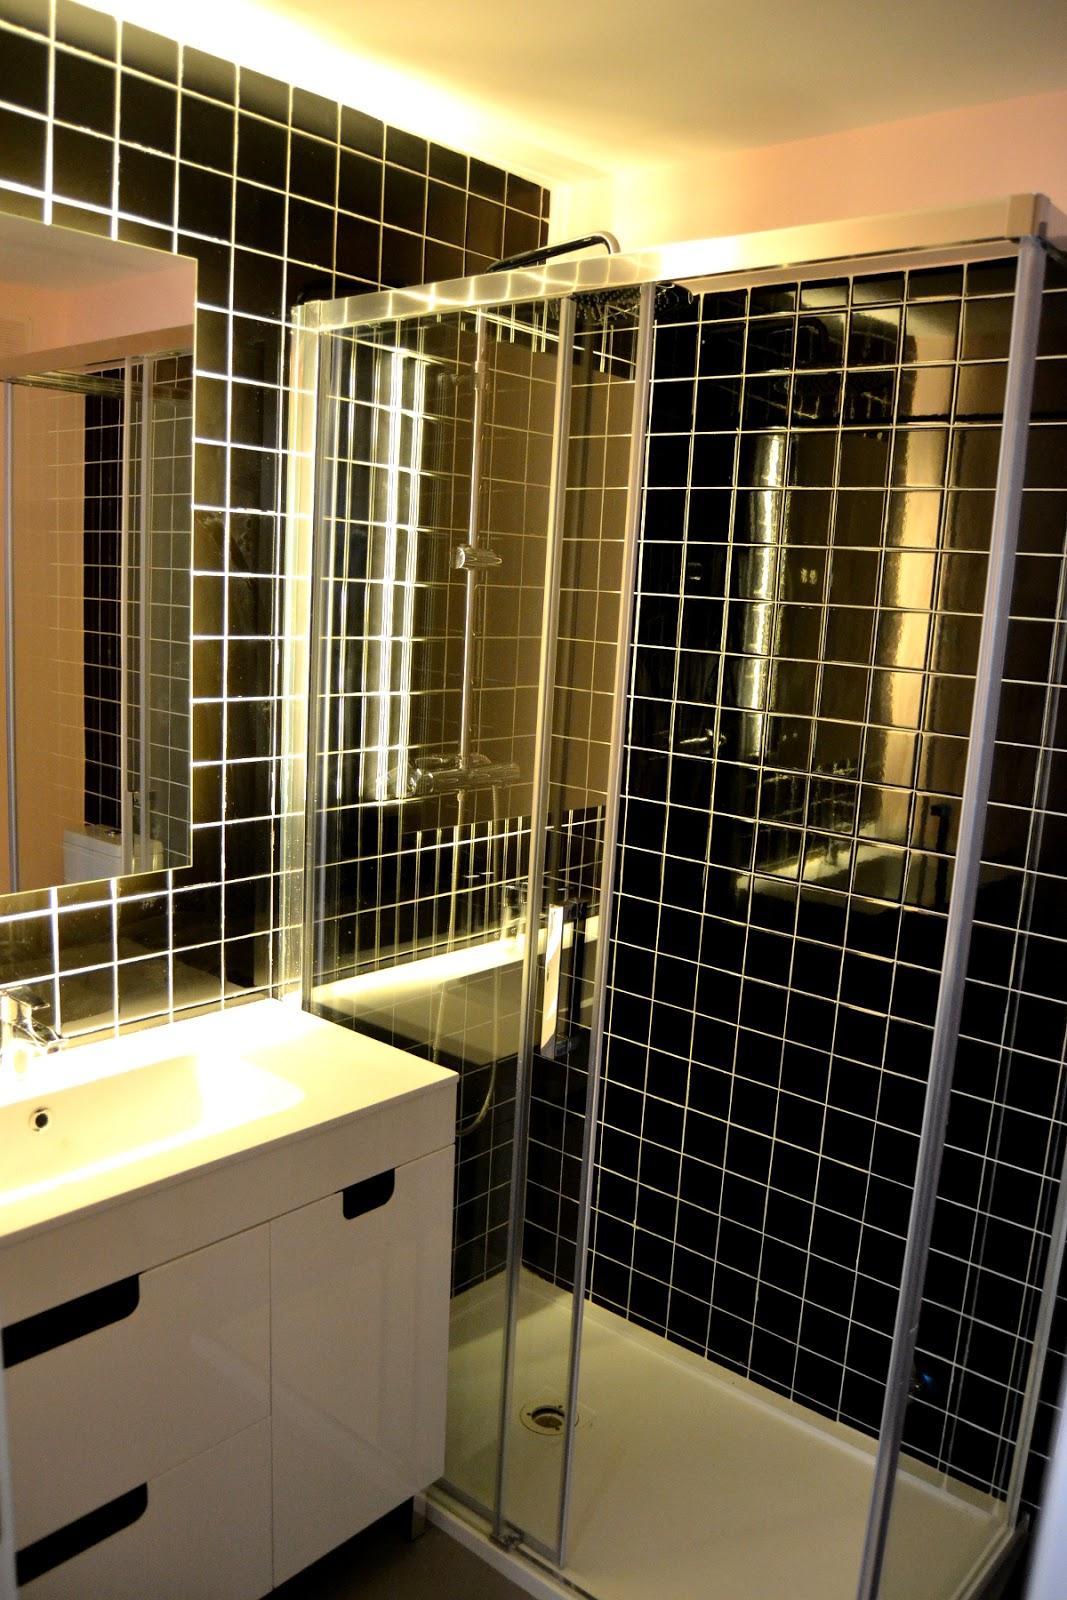 Austral construcciones loft en madrid - Lofts en madrid ...